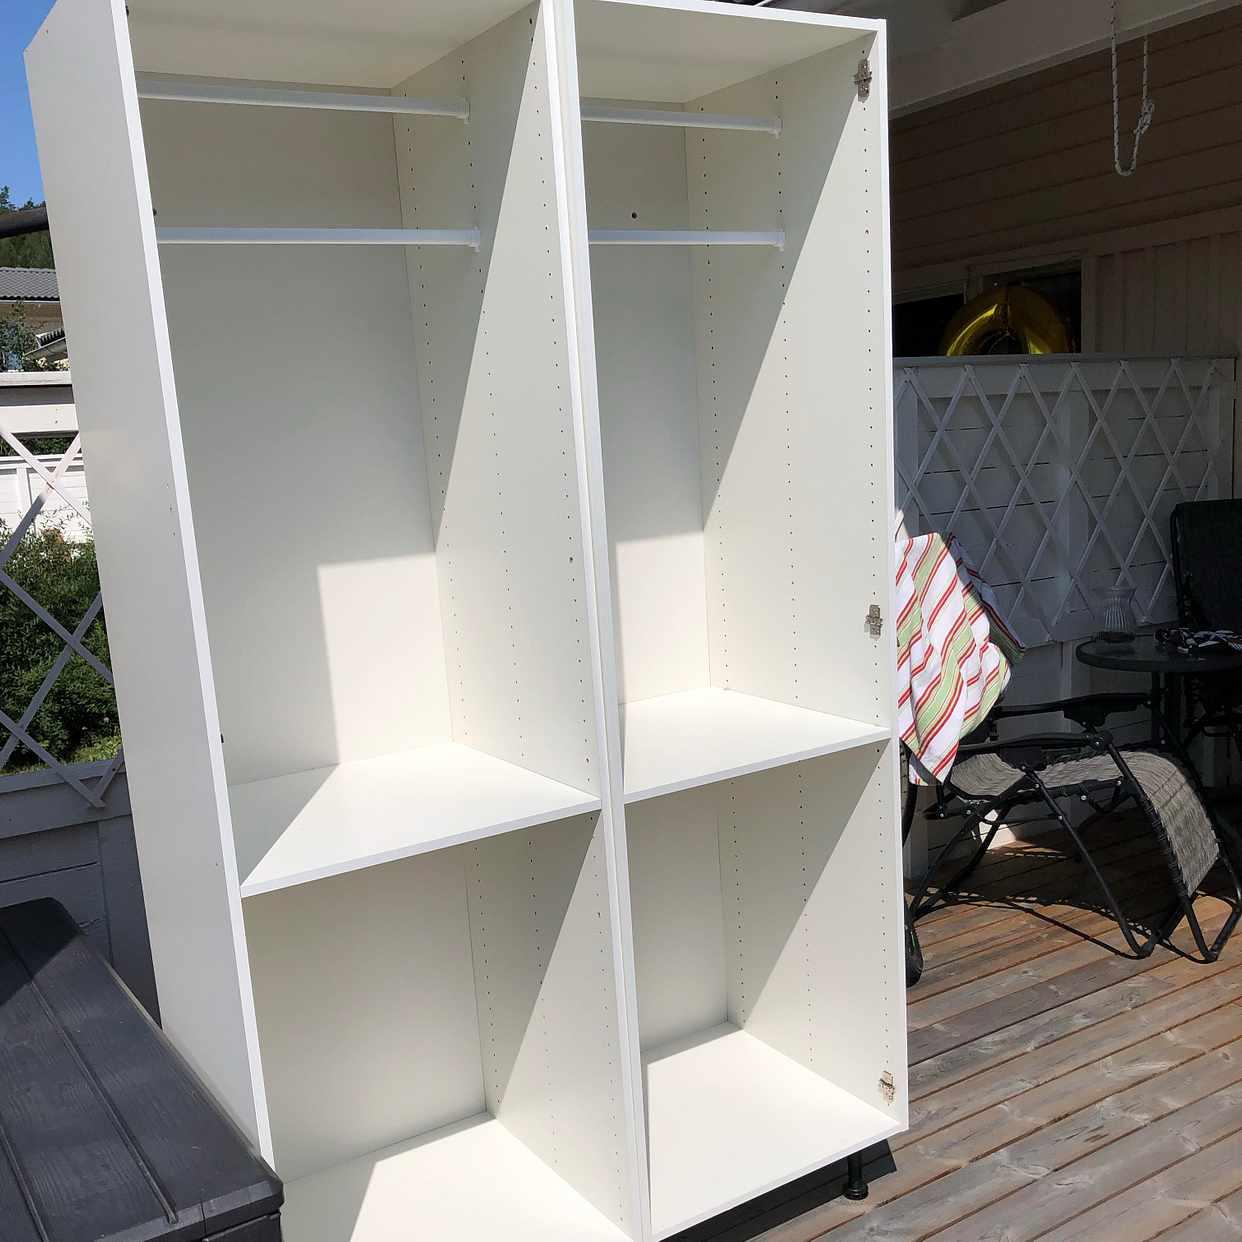 image of Gratis garderob. - Tullinge